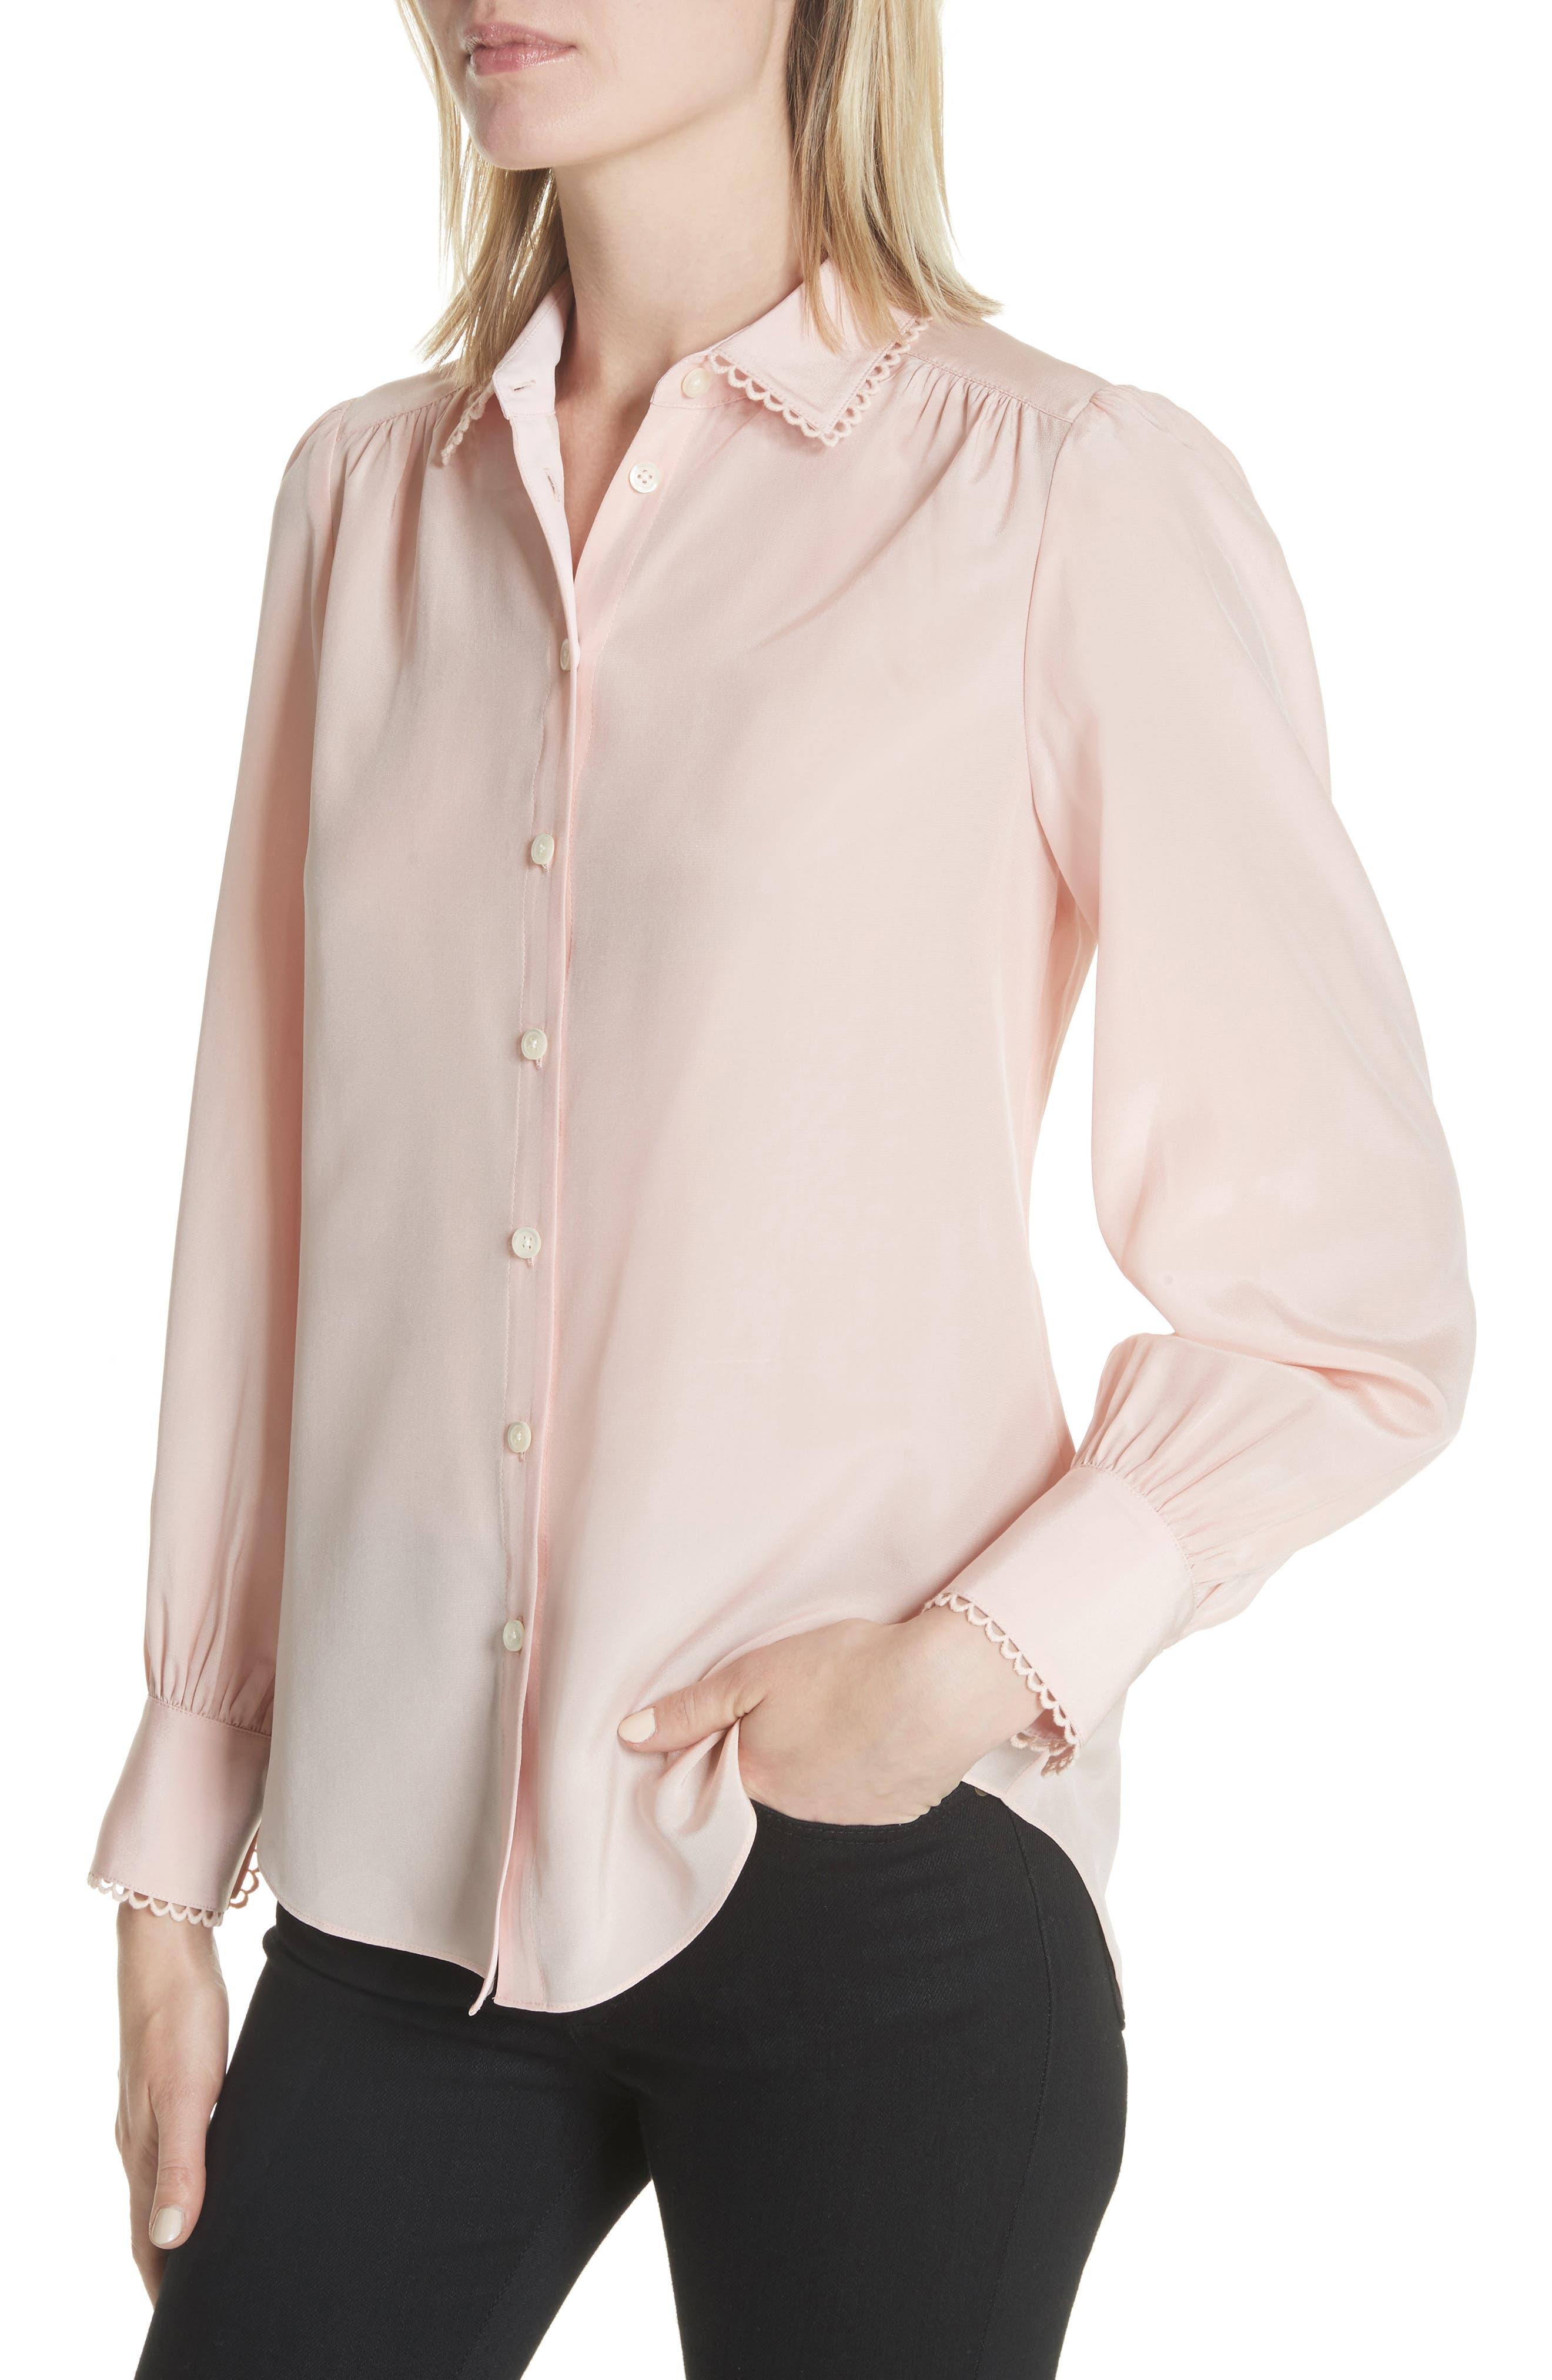 KATE SPADE NEW YORK,                             scallop trim silk shirt,                             Alternate thumbnail 4, color,                             663